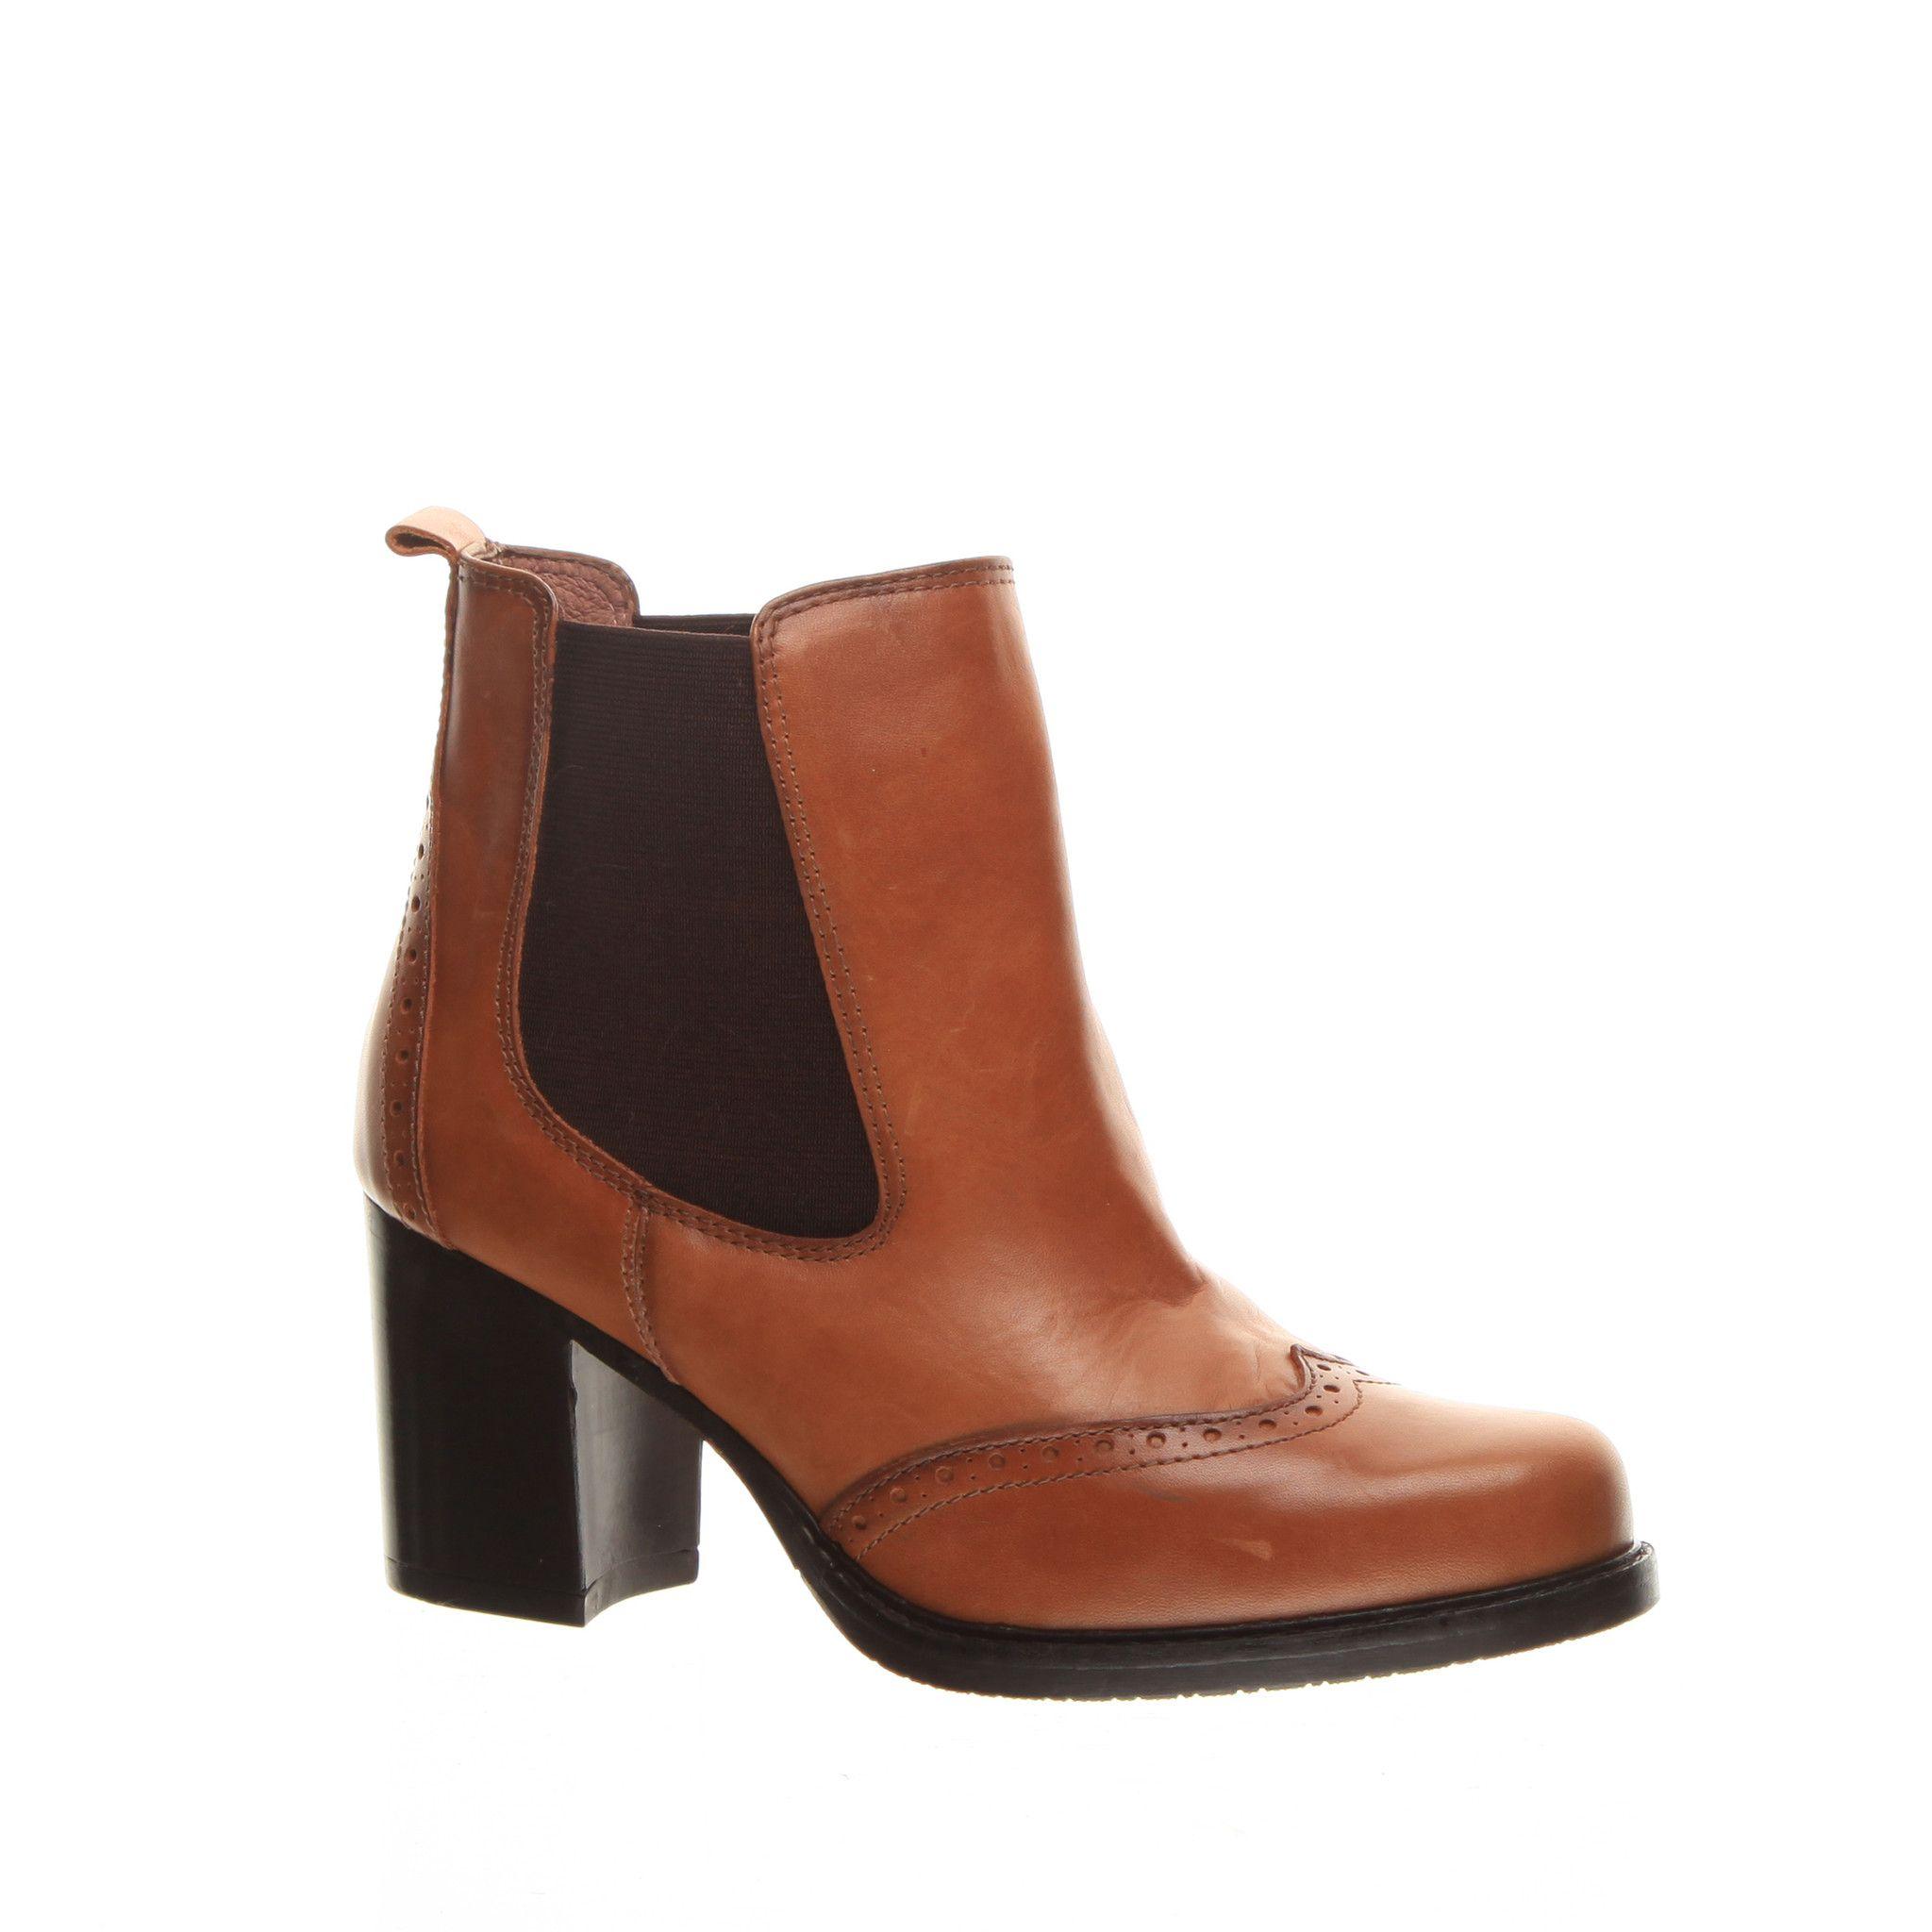 ae355fbce Gadea Oxford Ankle Boot Boston Cuero from ELLA Shoes Vancouver ...